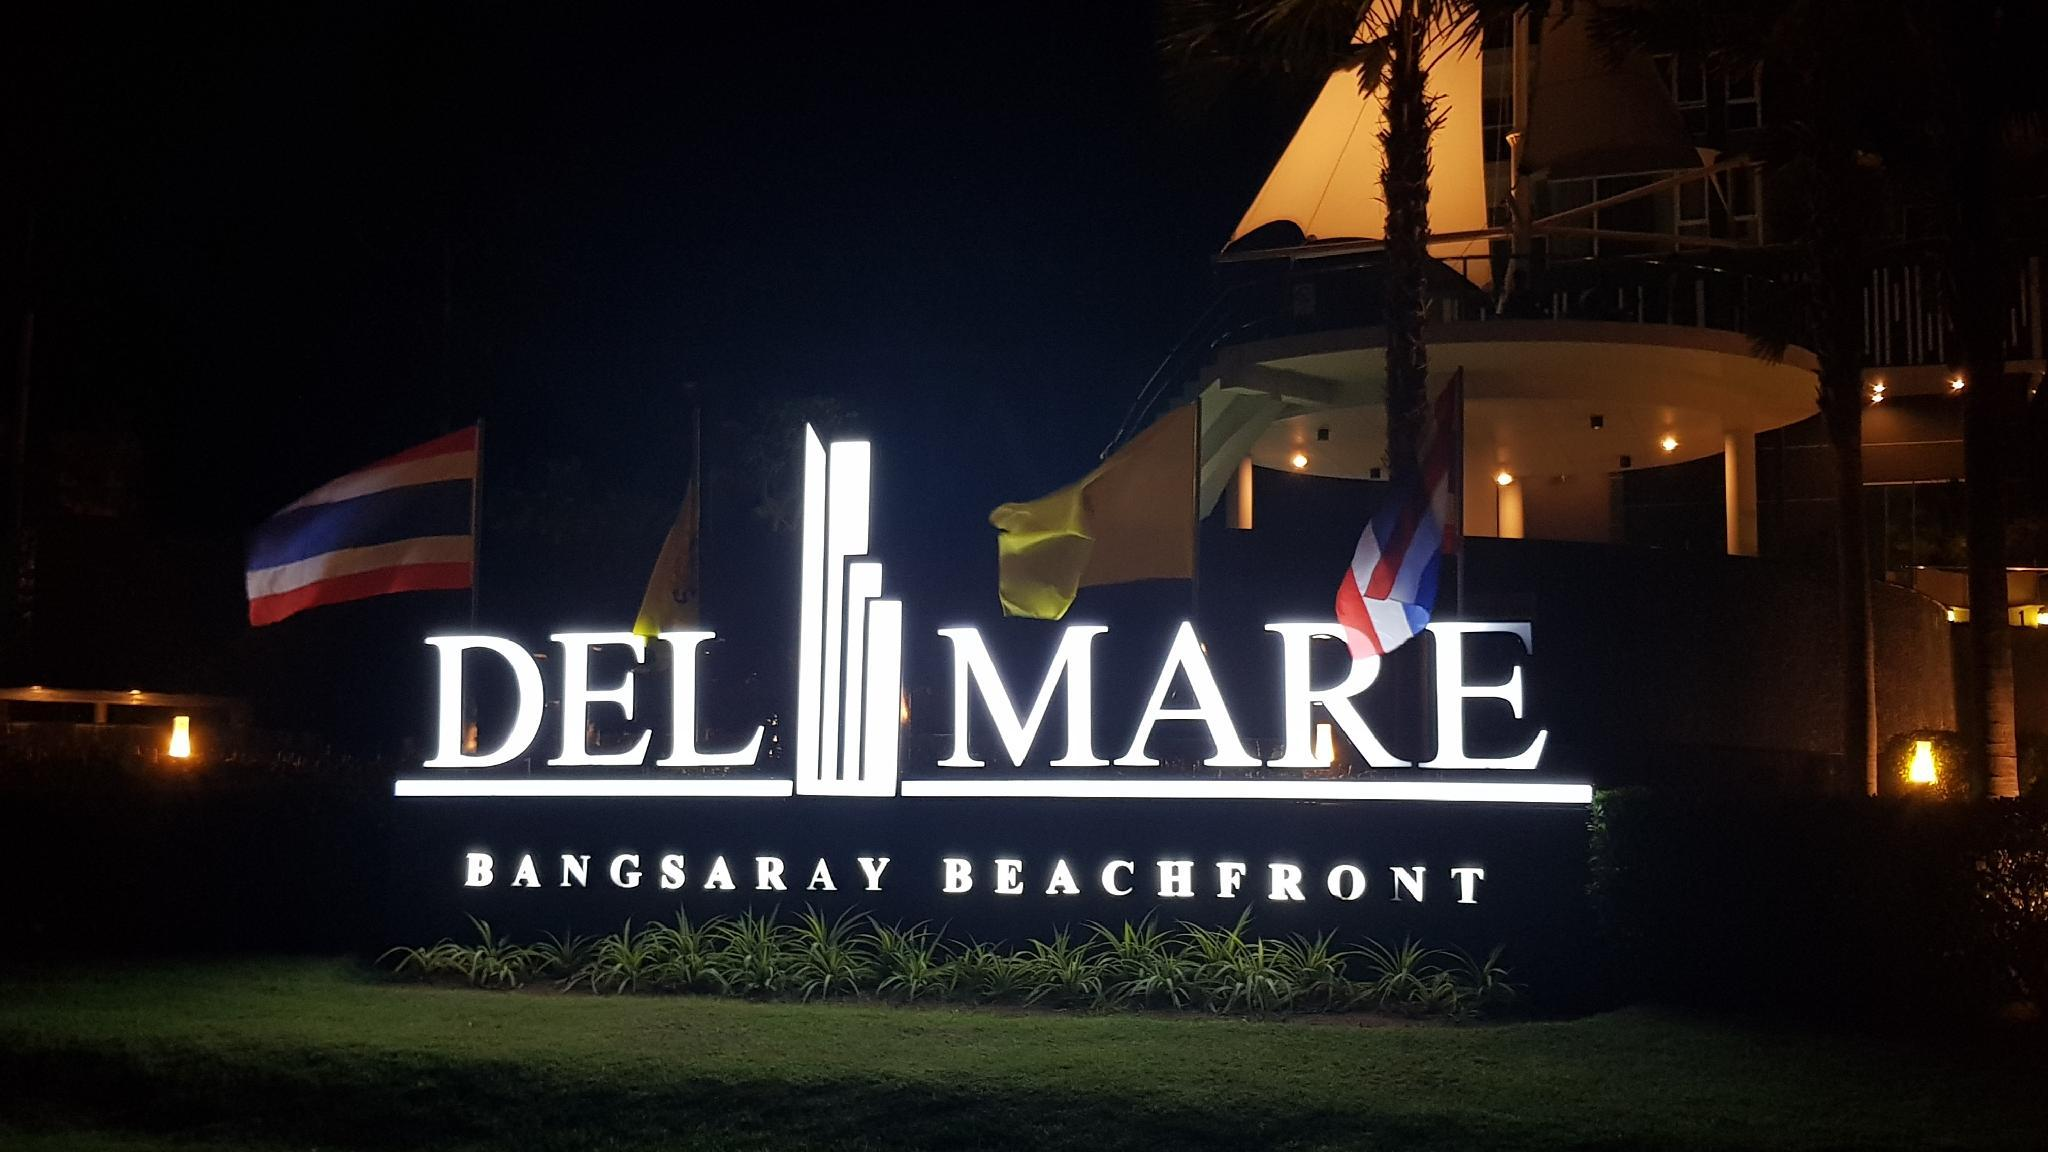 Delmare Bangsaray Pattaya